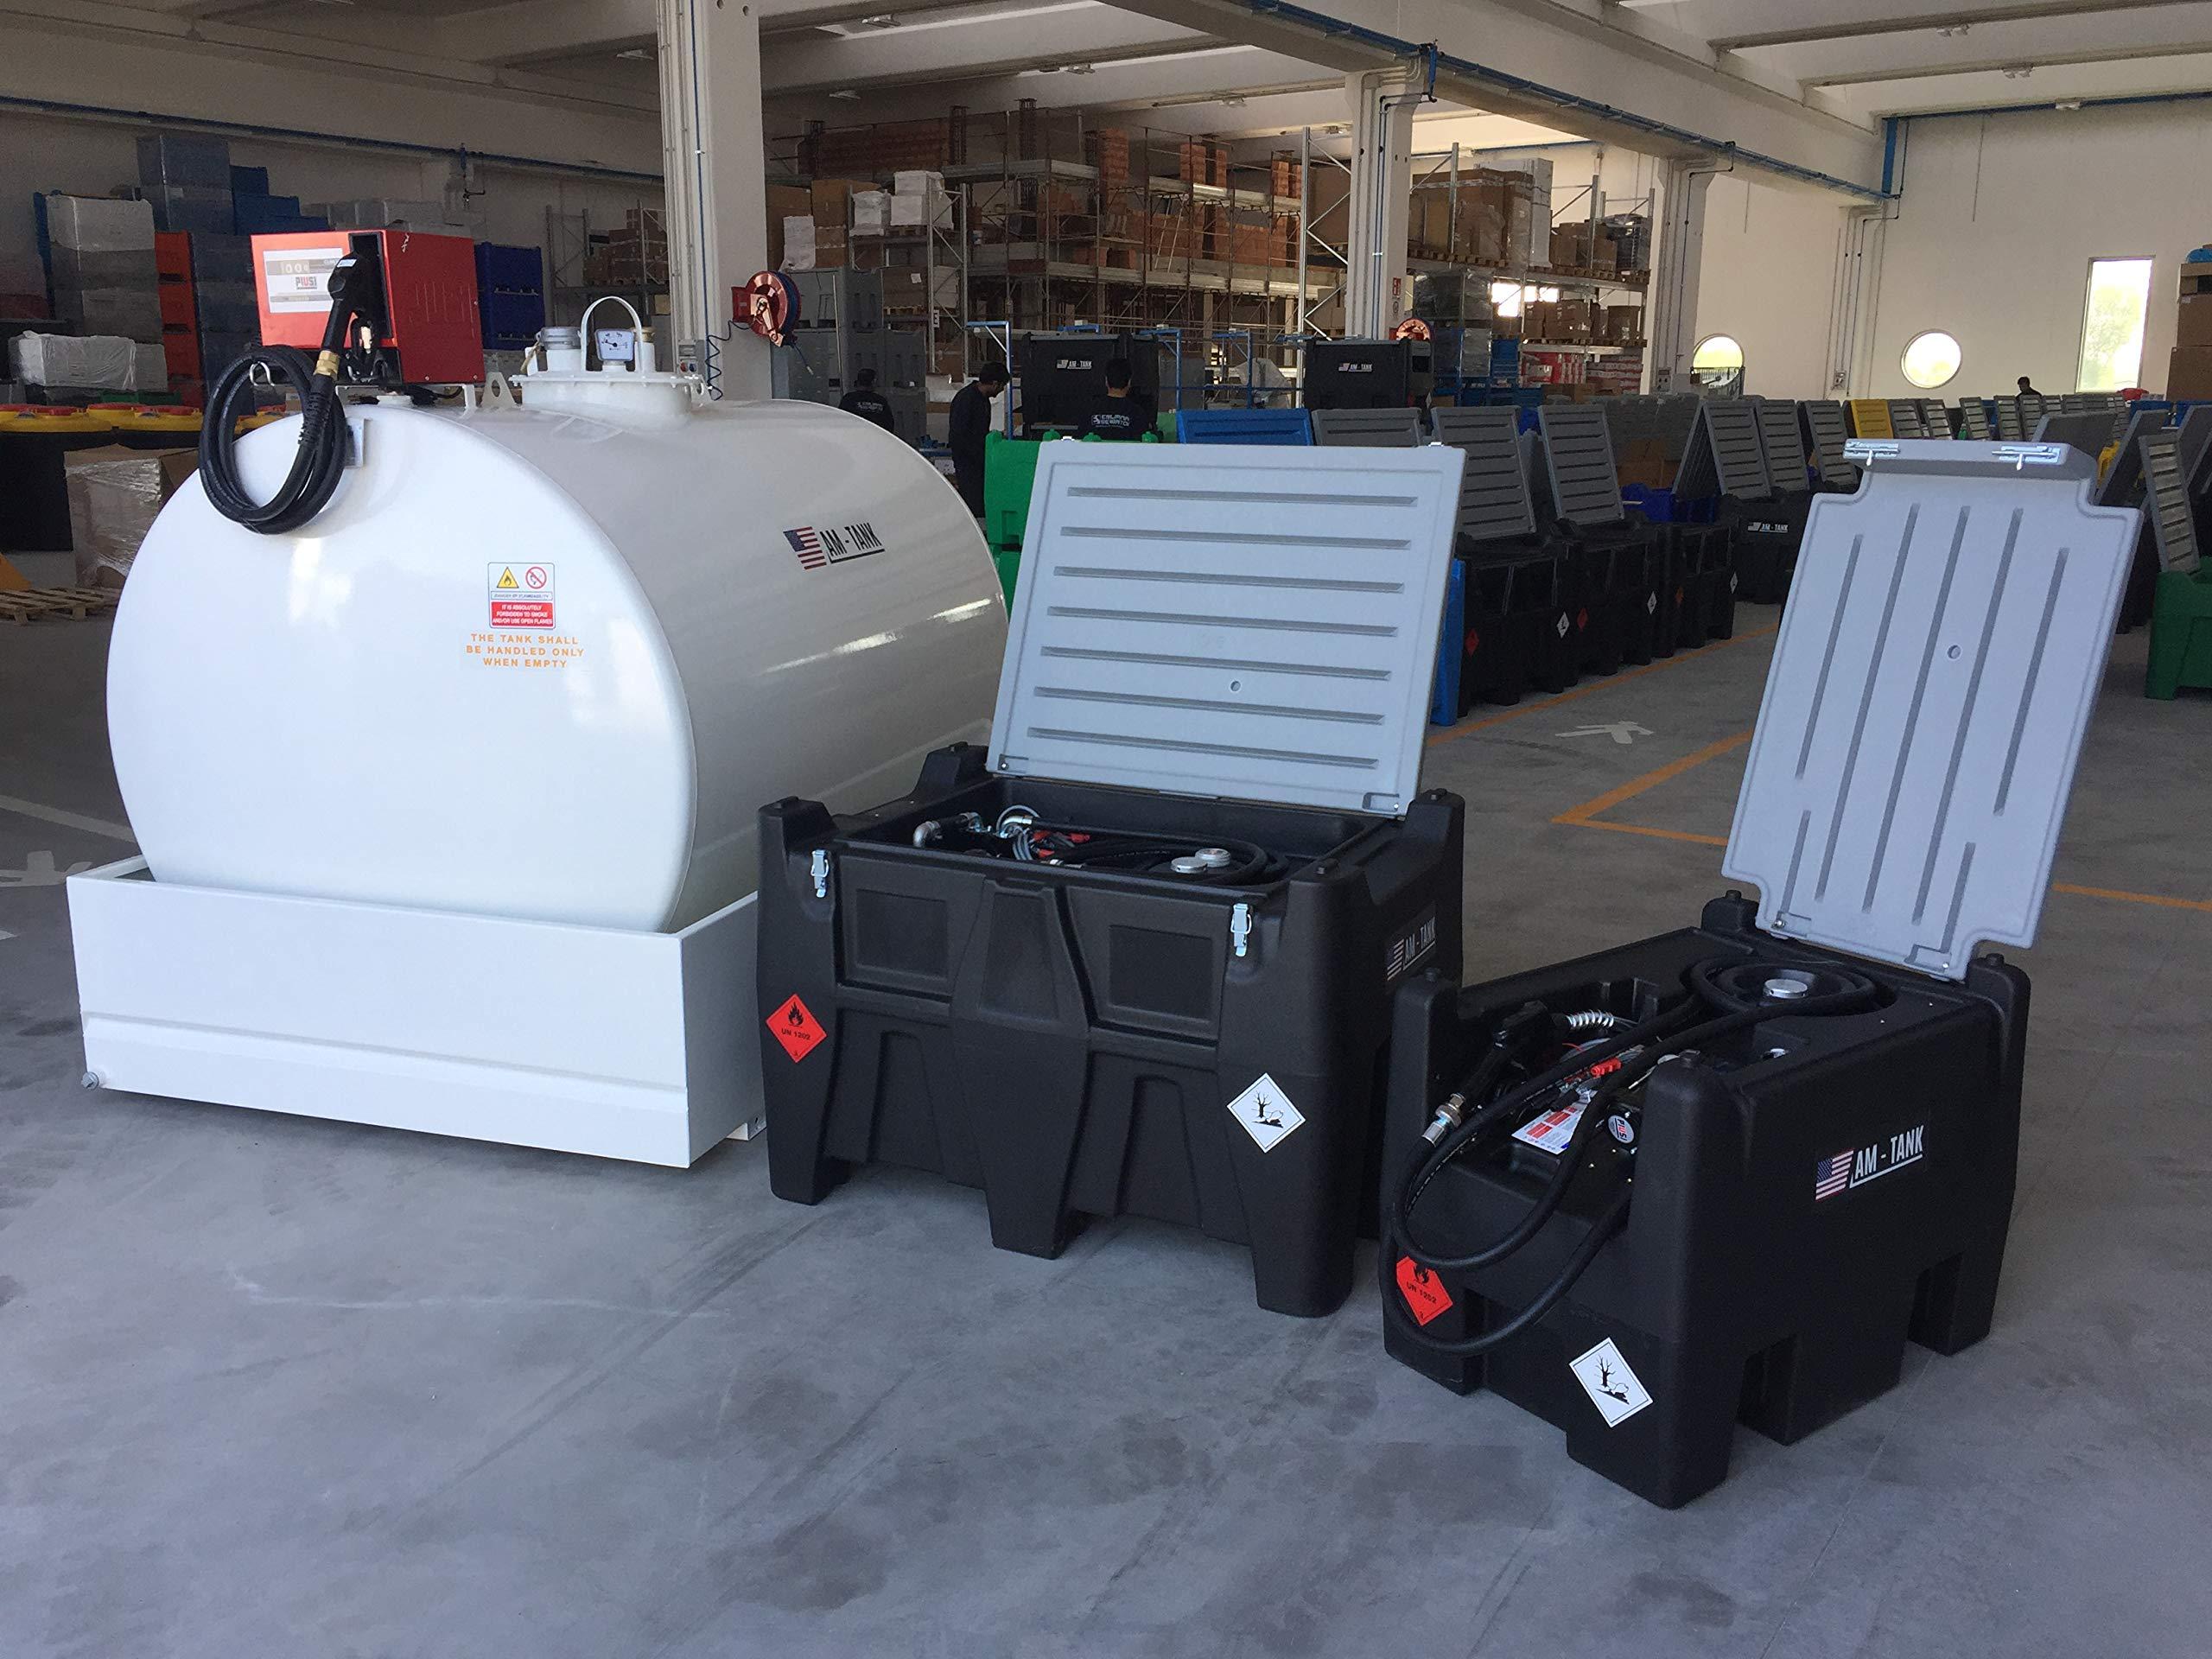 Emiliana Serbatoi Carrytank 58 Gallon Portable Diesel Container with Electric Pump by Emiliana Serbatoi